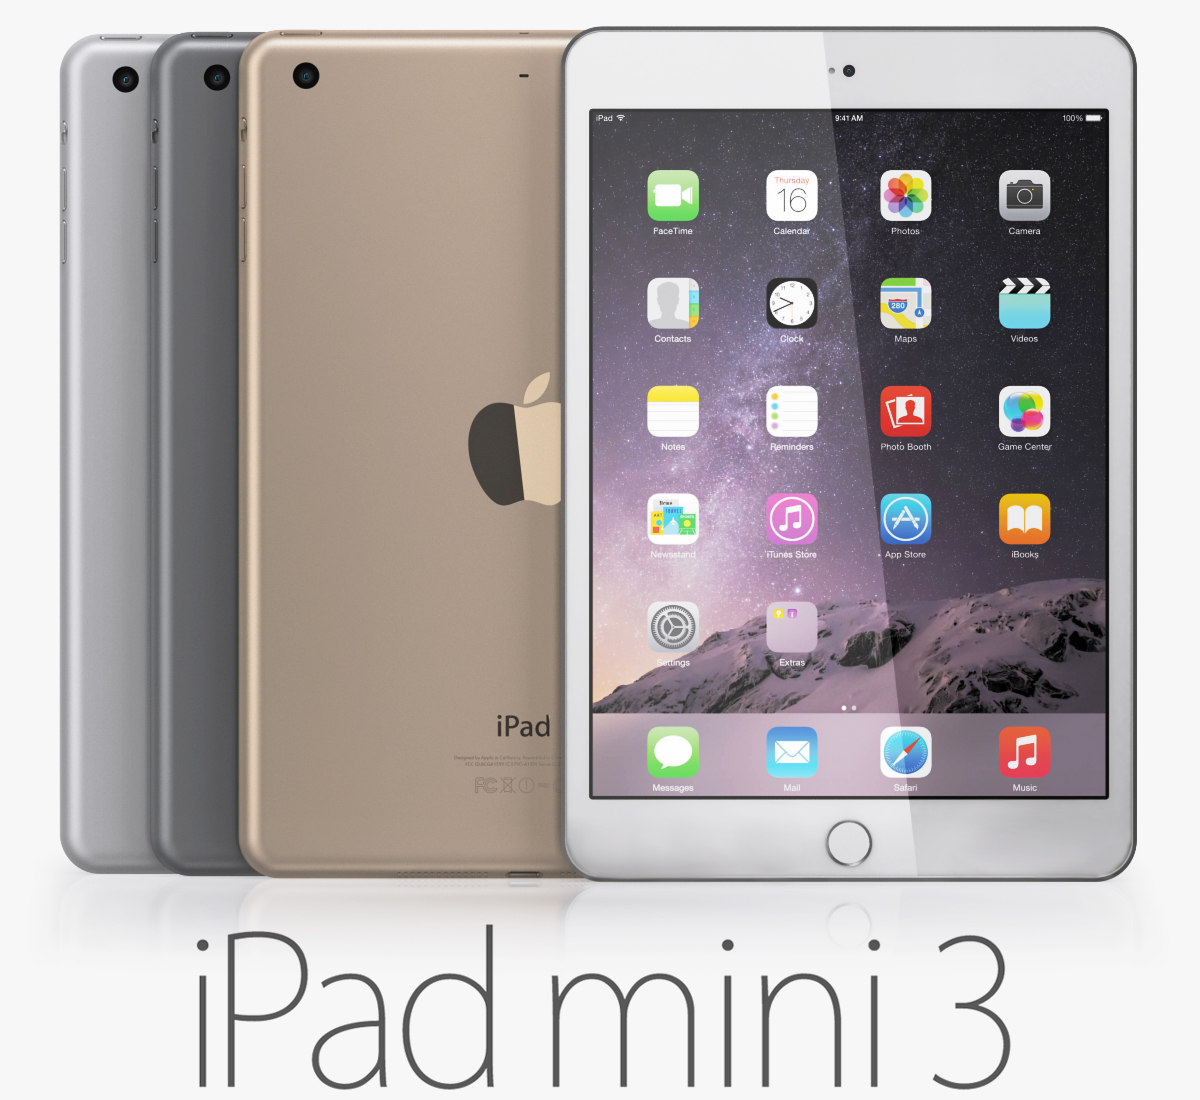 iPad_Mini_3_01.jpg